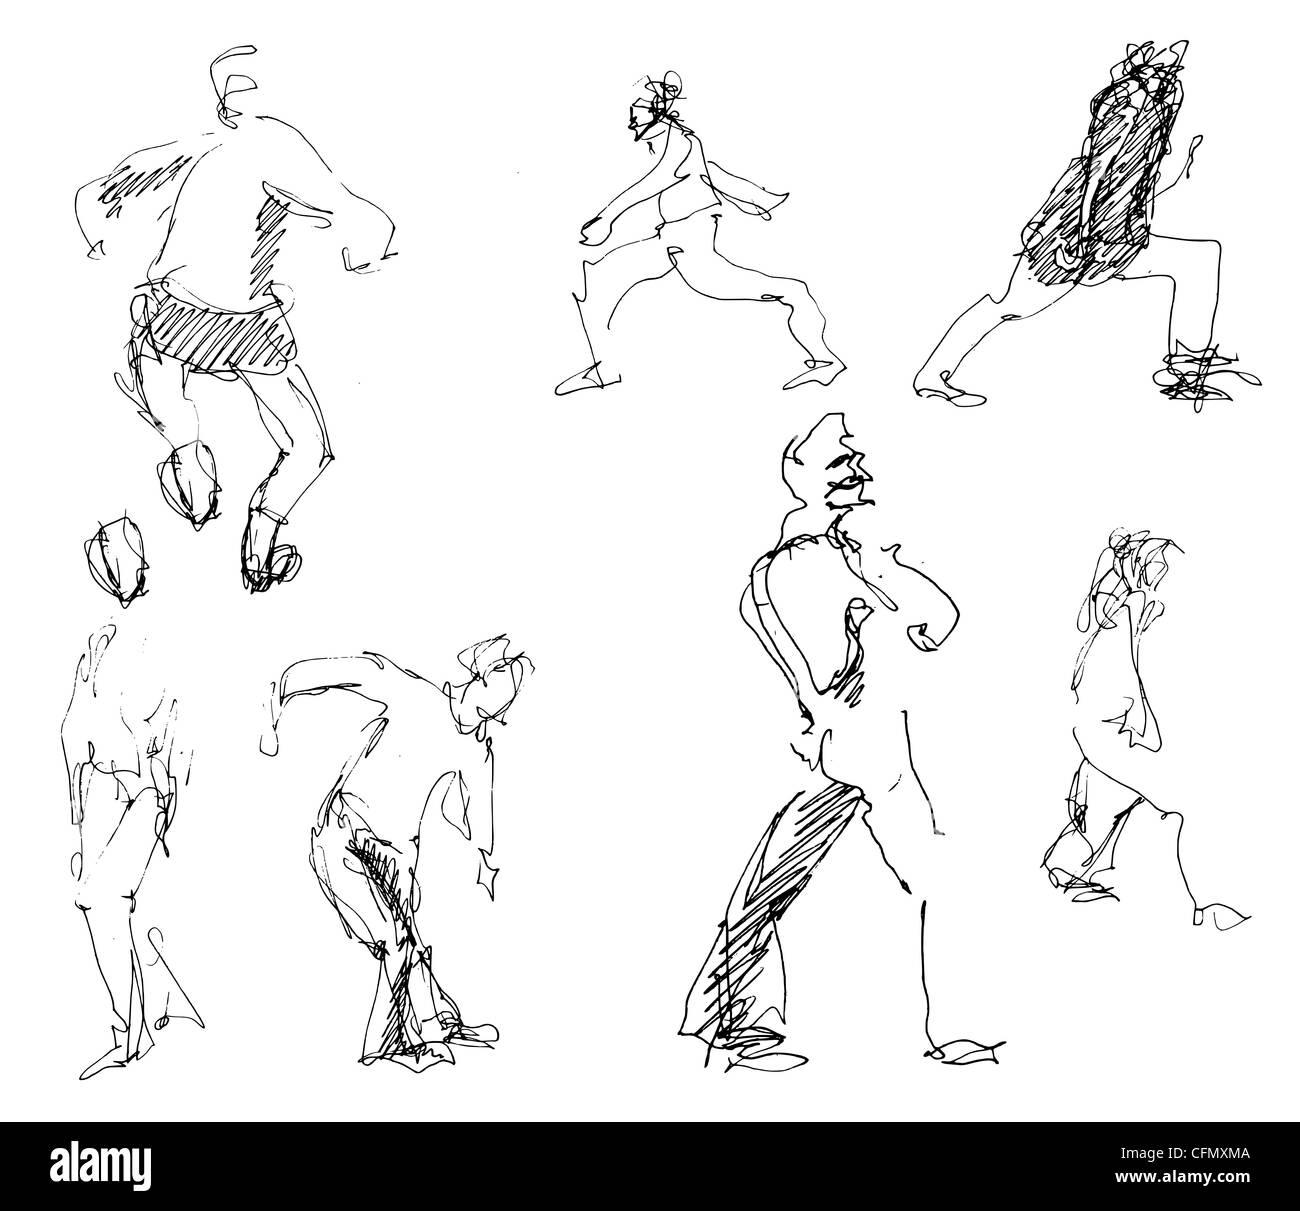 Hand Positions Stockfotos & Hand Positions Bilder - Seite 9 - Alamy